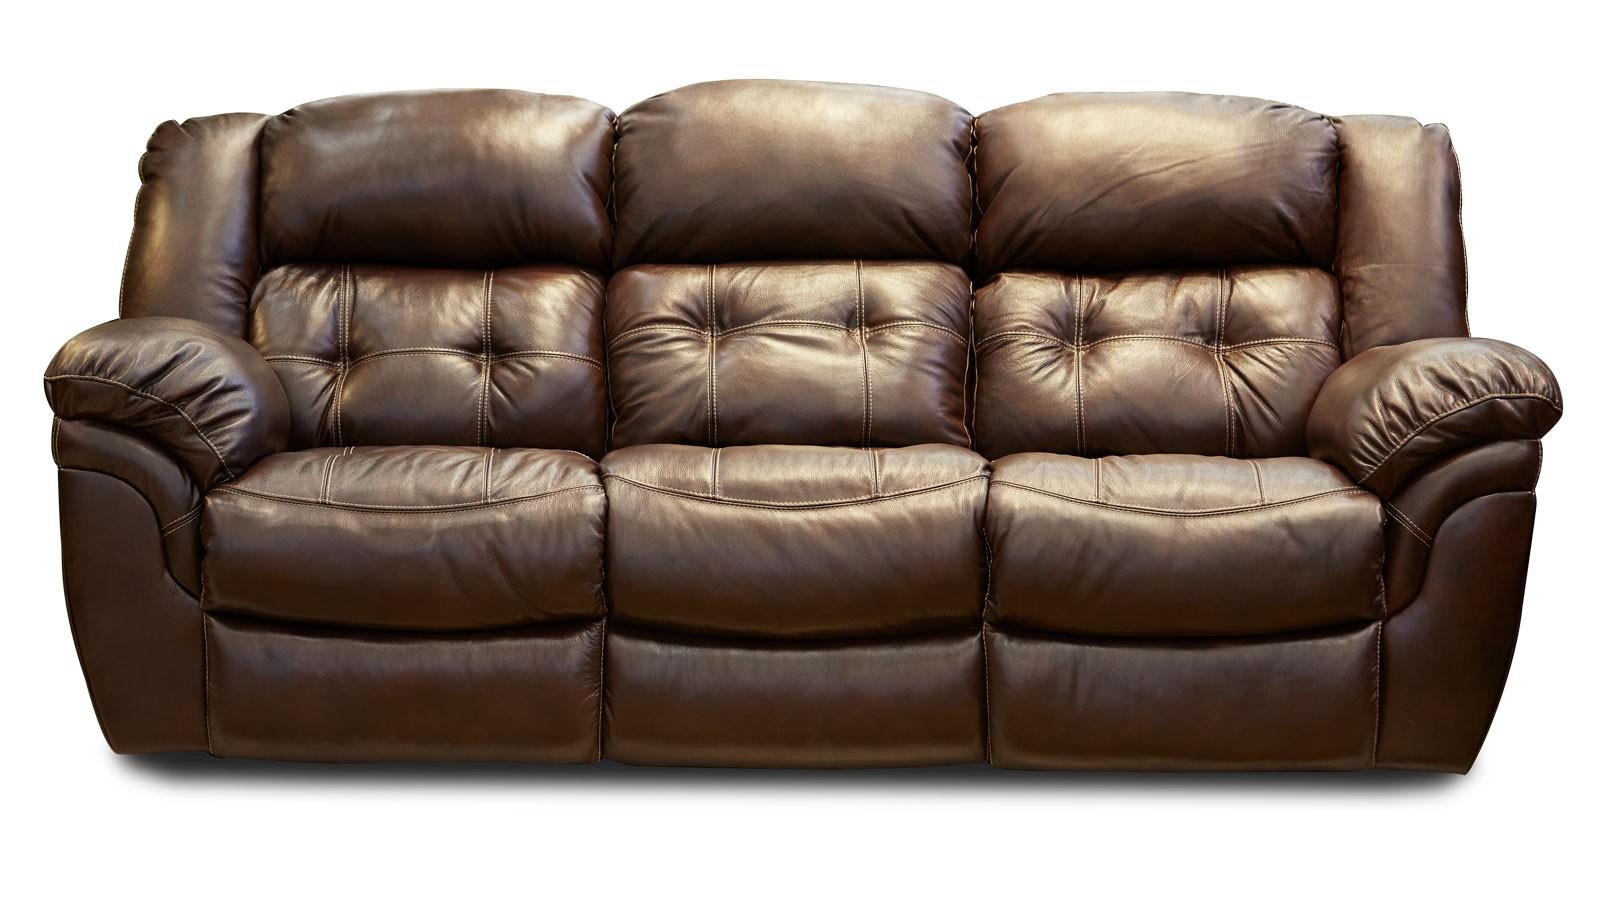 leather furniture cheyenne whisky reclining sofa DIXGYRF